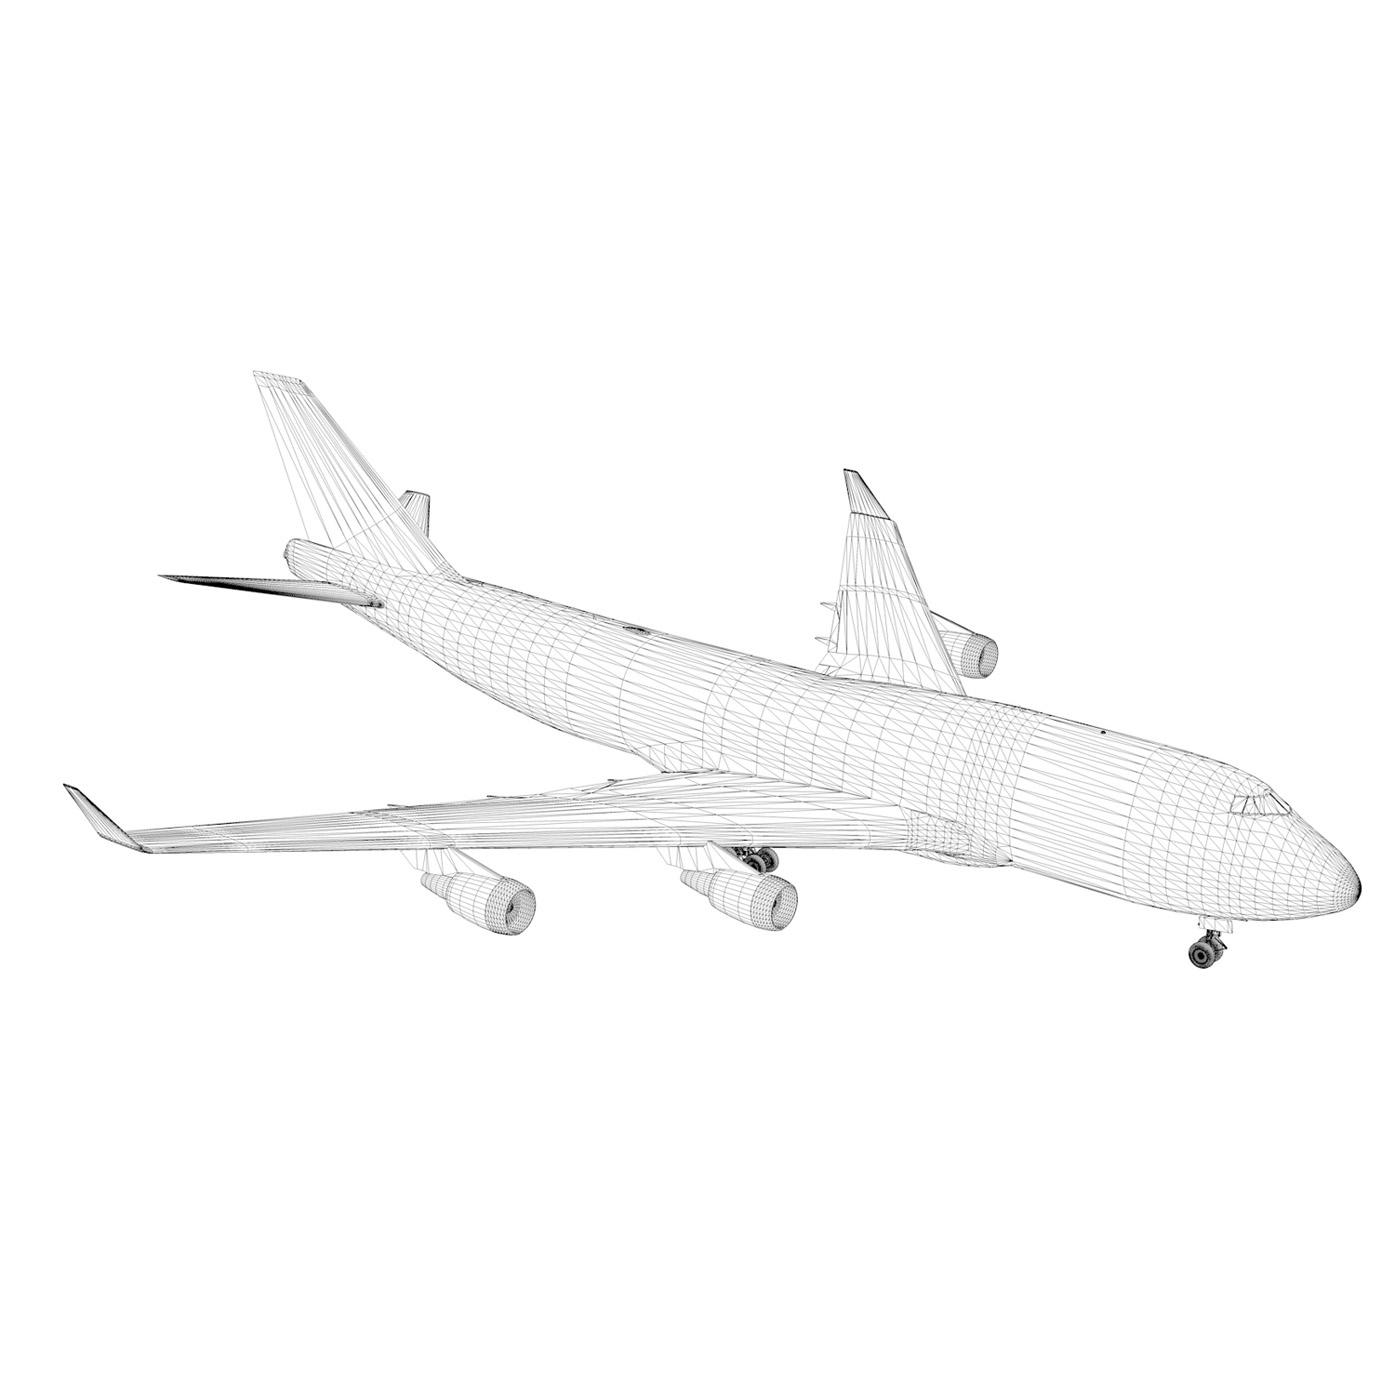 boeing 747 qantas wunala dreaming 3d model 3ds fbx c4d lwo obj 281798